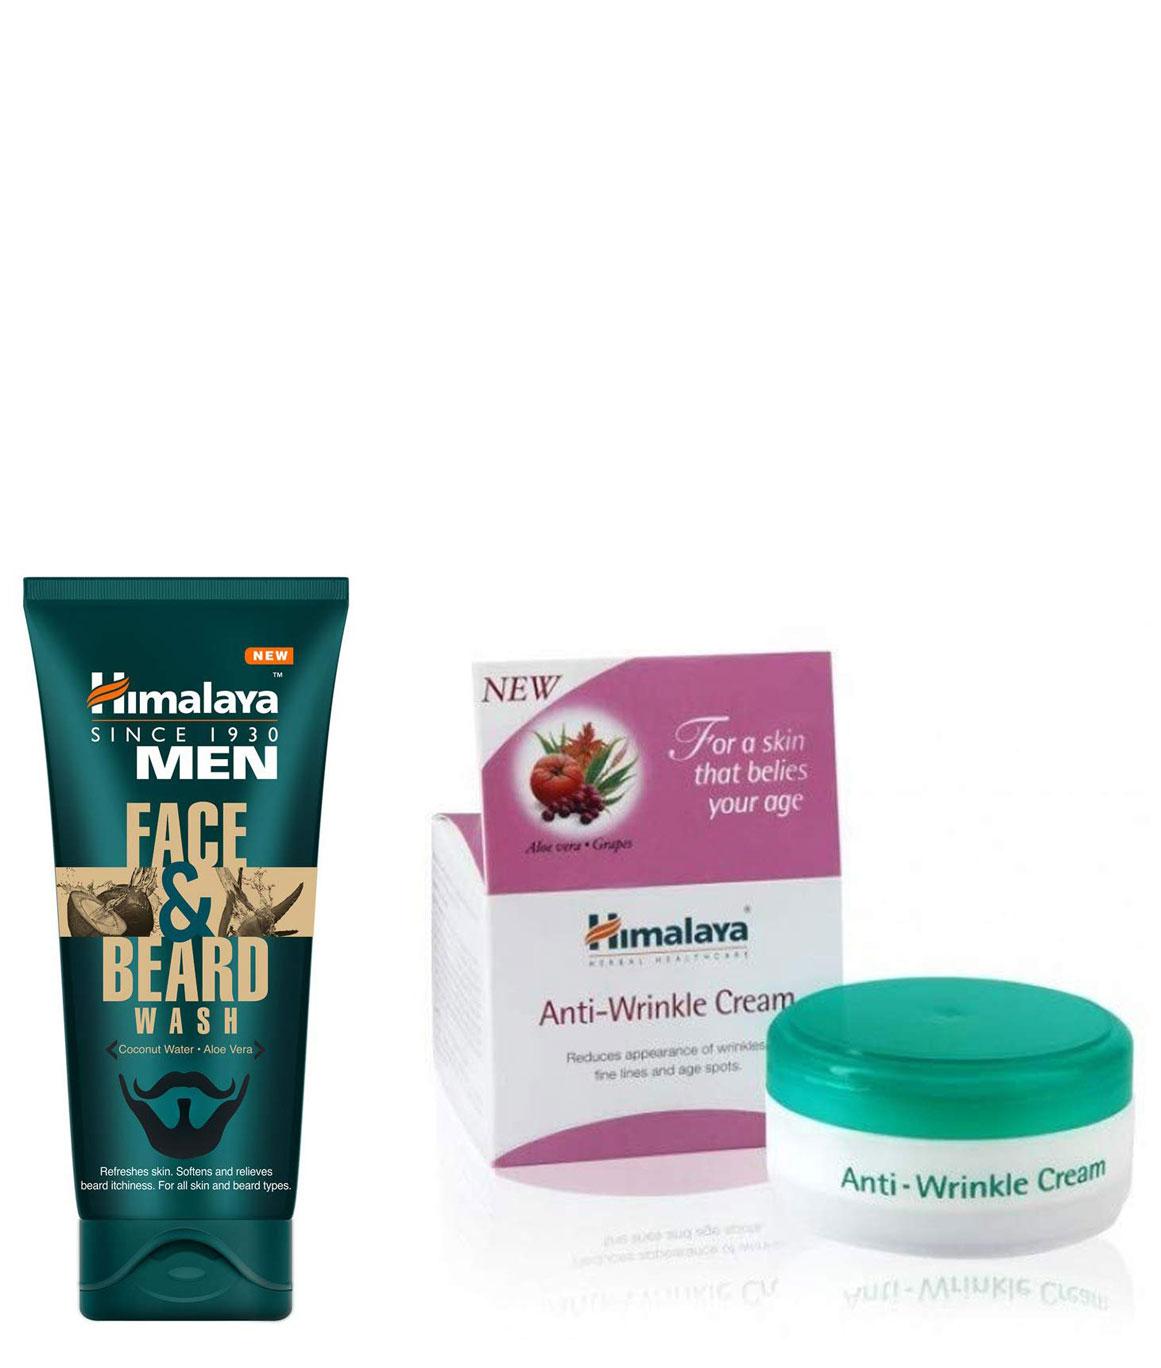 Himalaya Men Face And Beard Wash 80ml and Himalaya Herbals Anti-Wrinkle Cream 50g